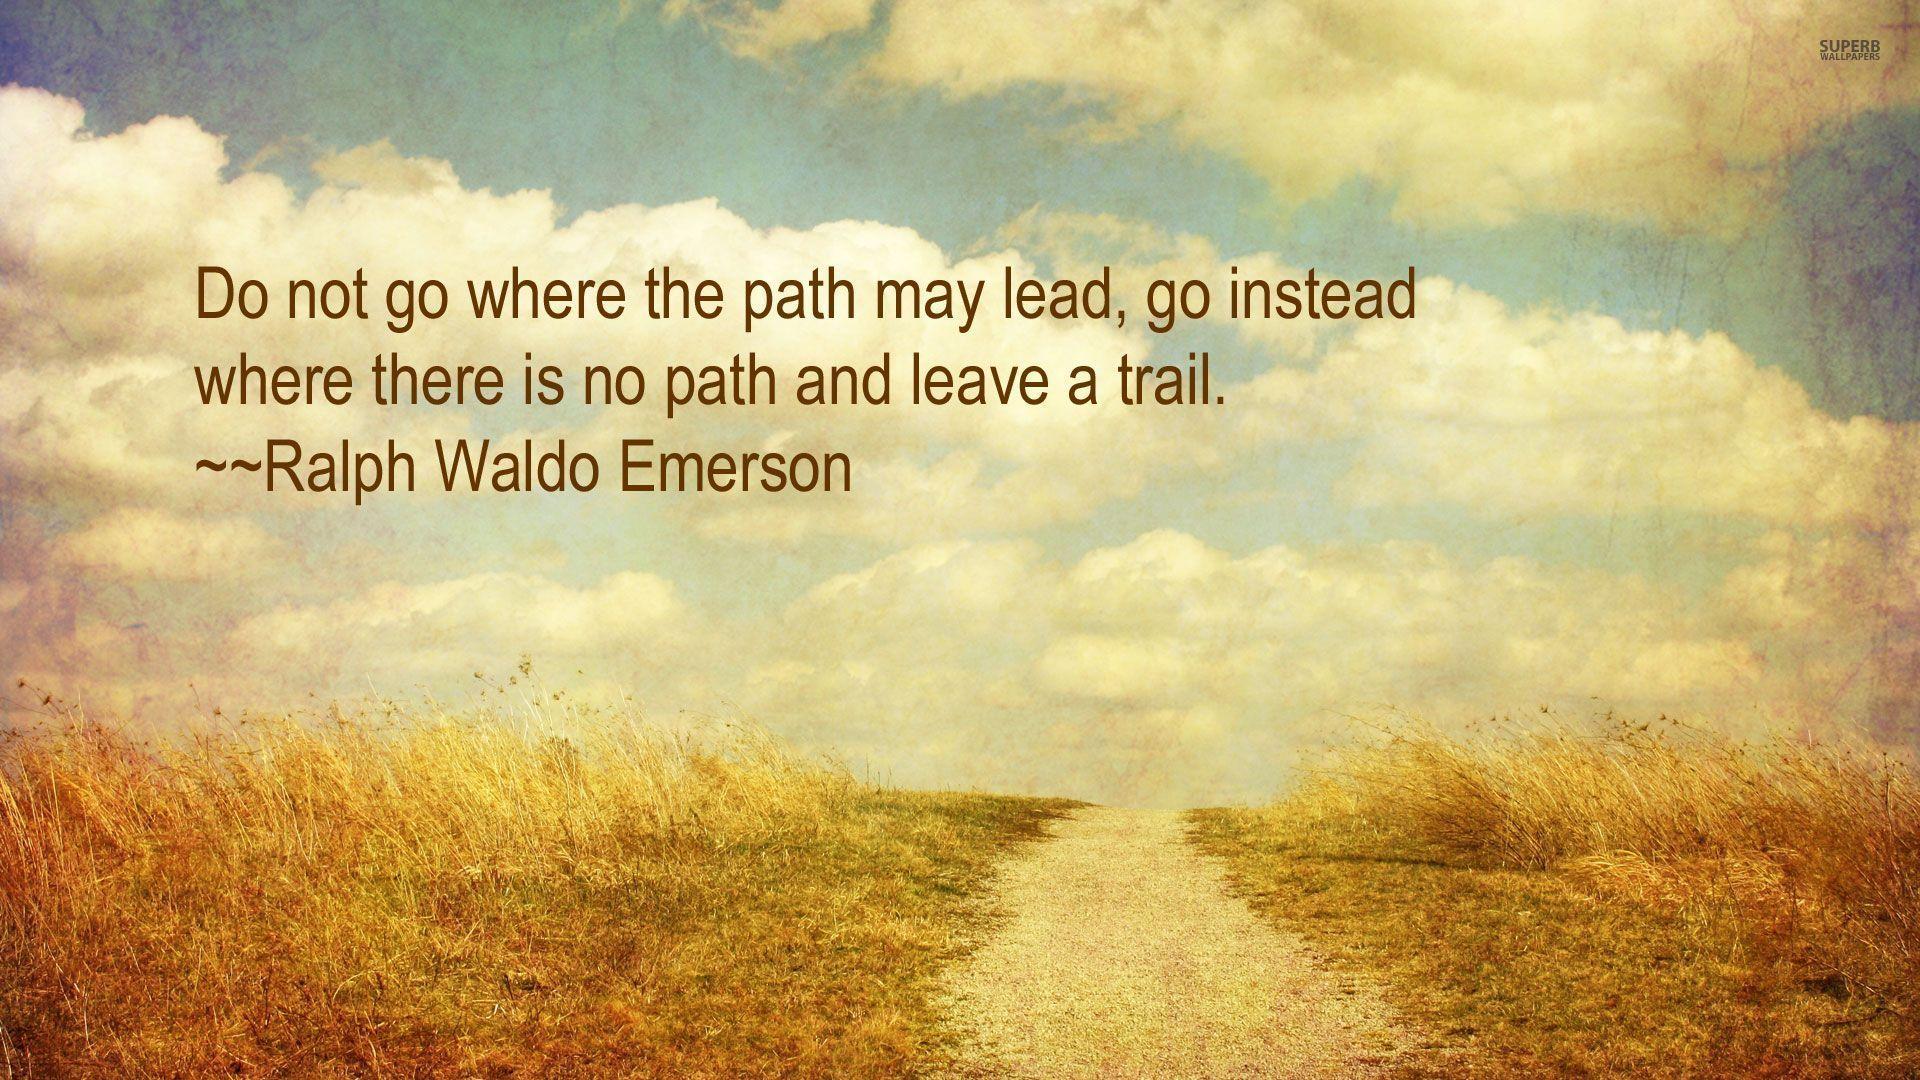 Ralph Waldo Emerson Quotes Path. QuotesGram